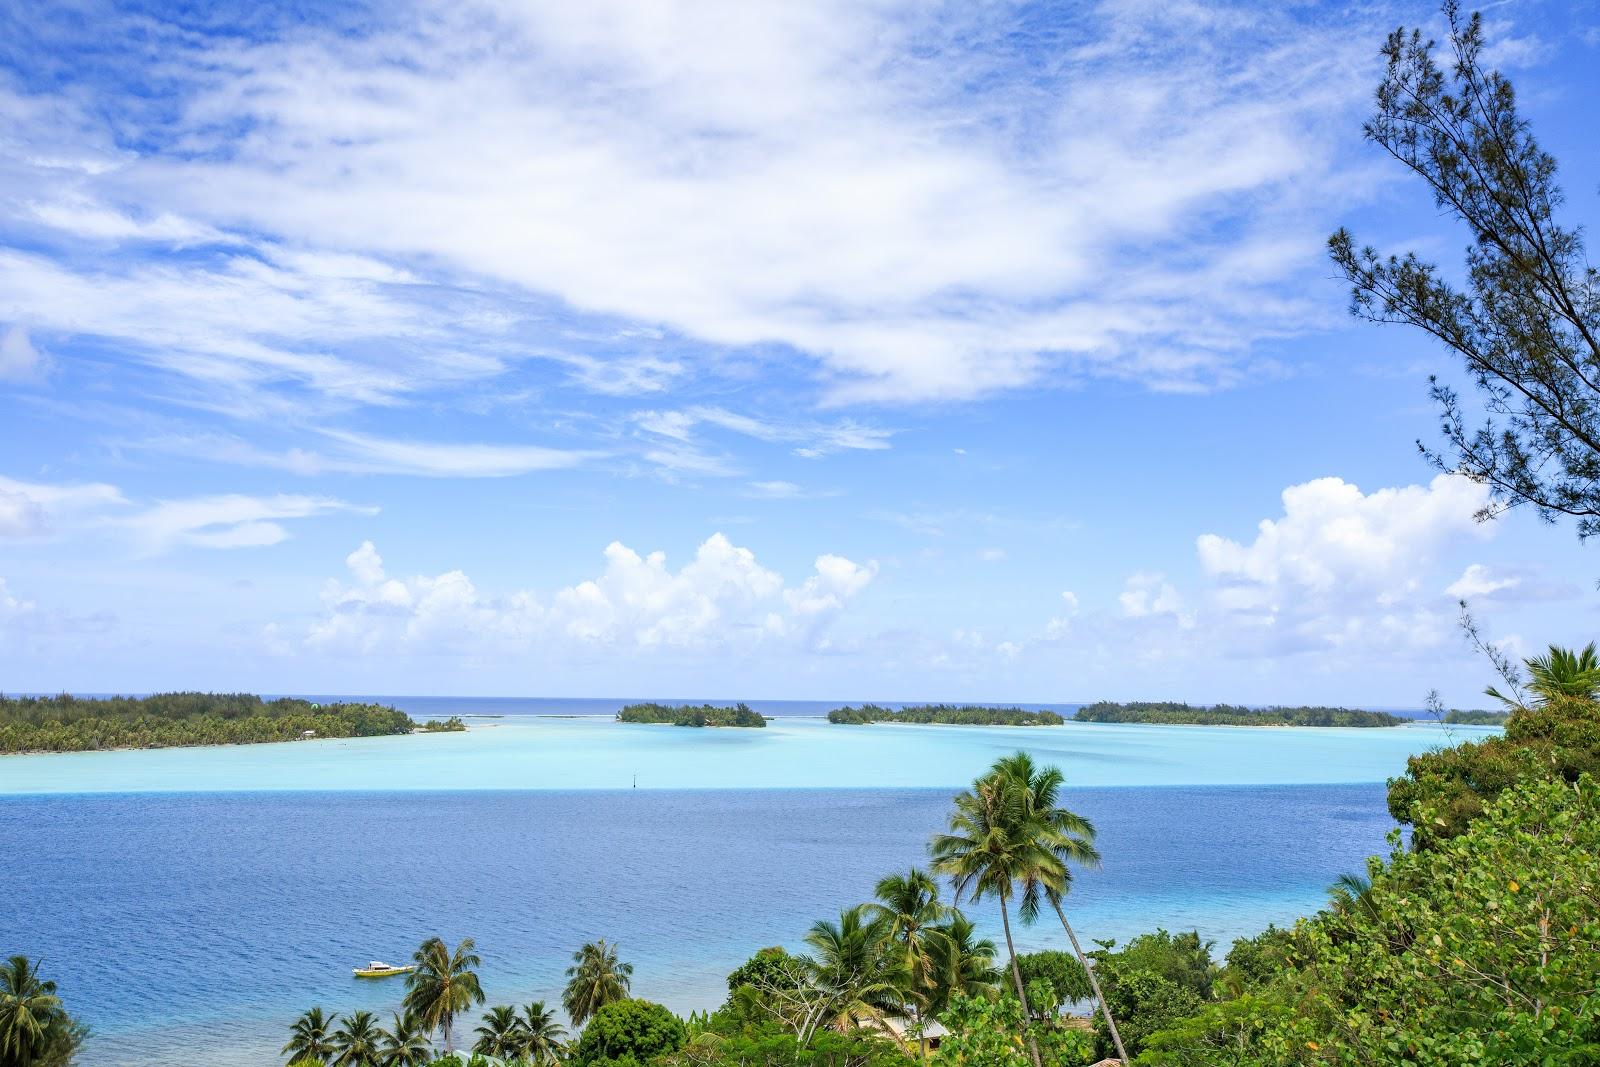 WWII Guns Faanui 從加農砲往海看過去就是一排motu,最右邊則是Bora Bora 機場